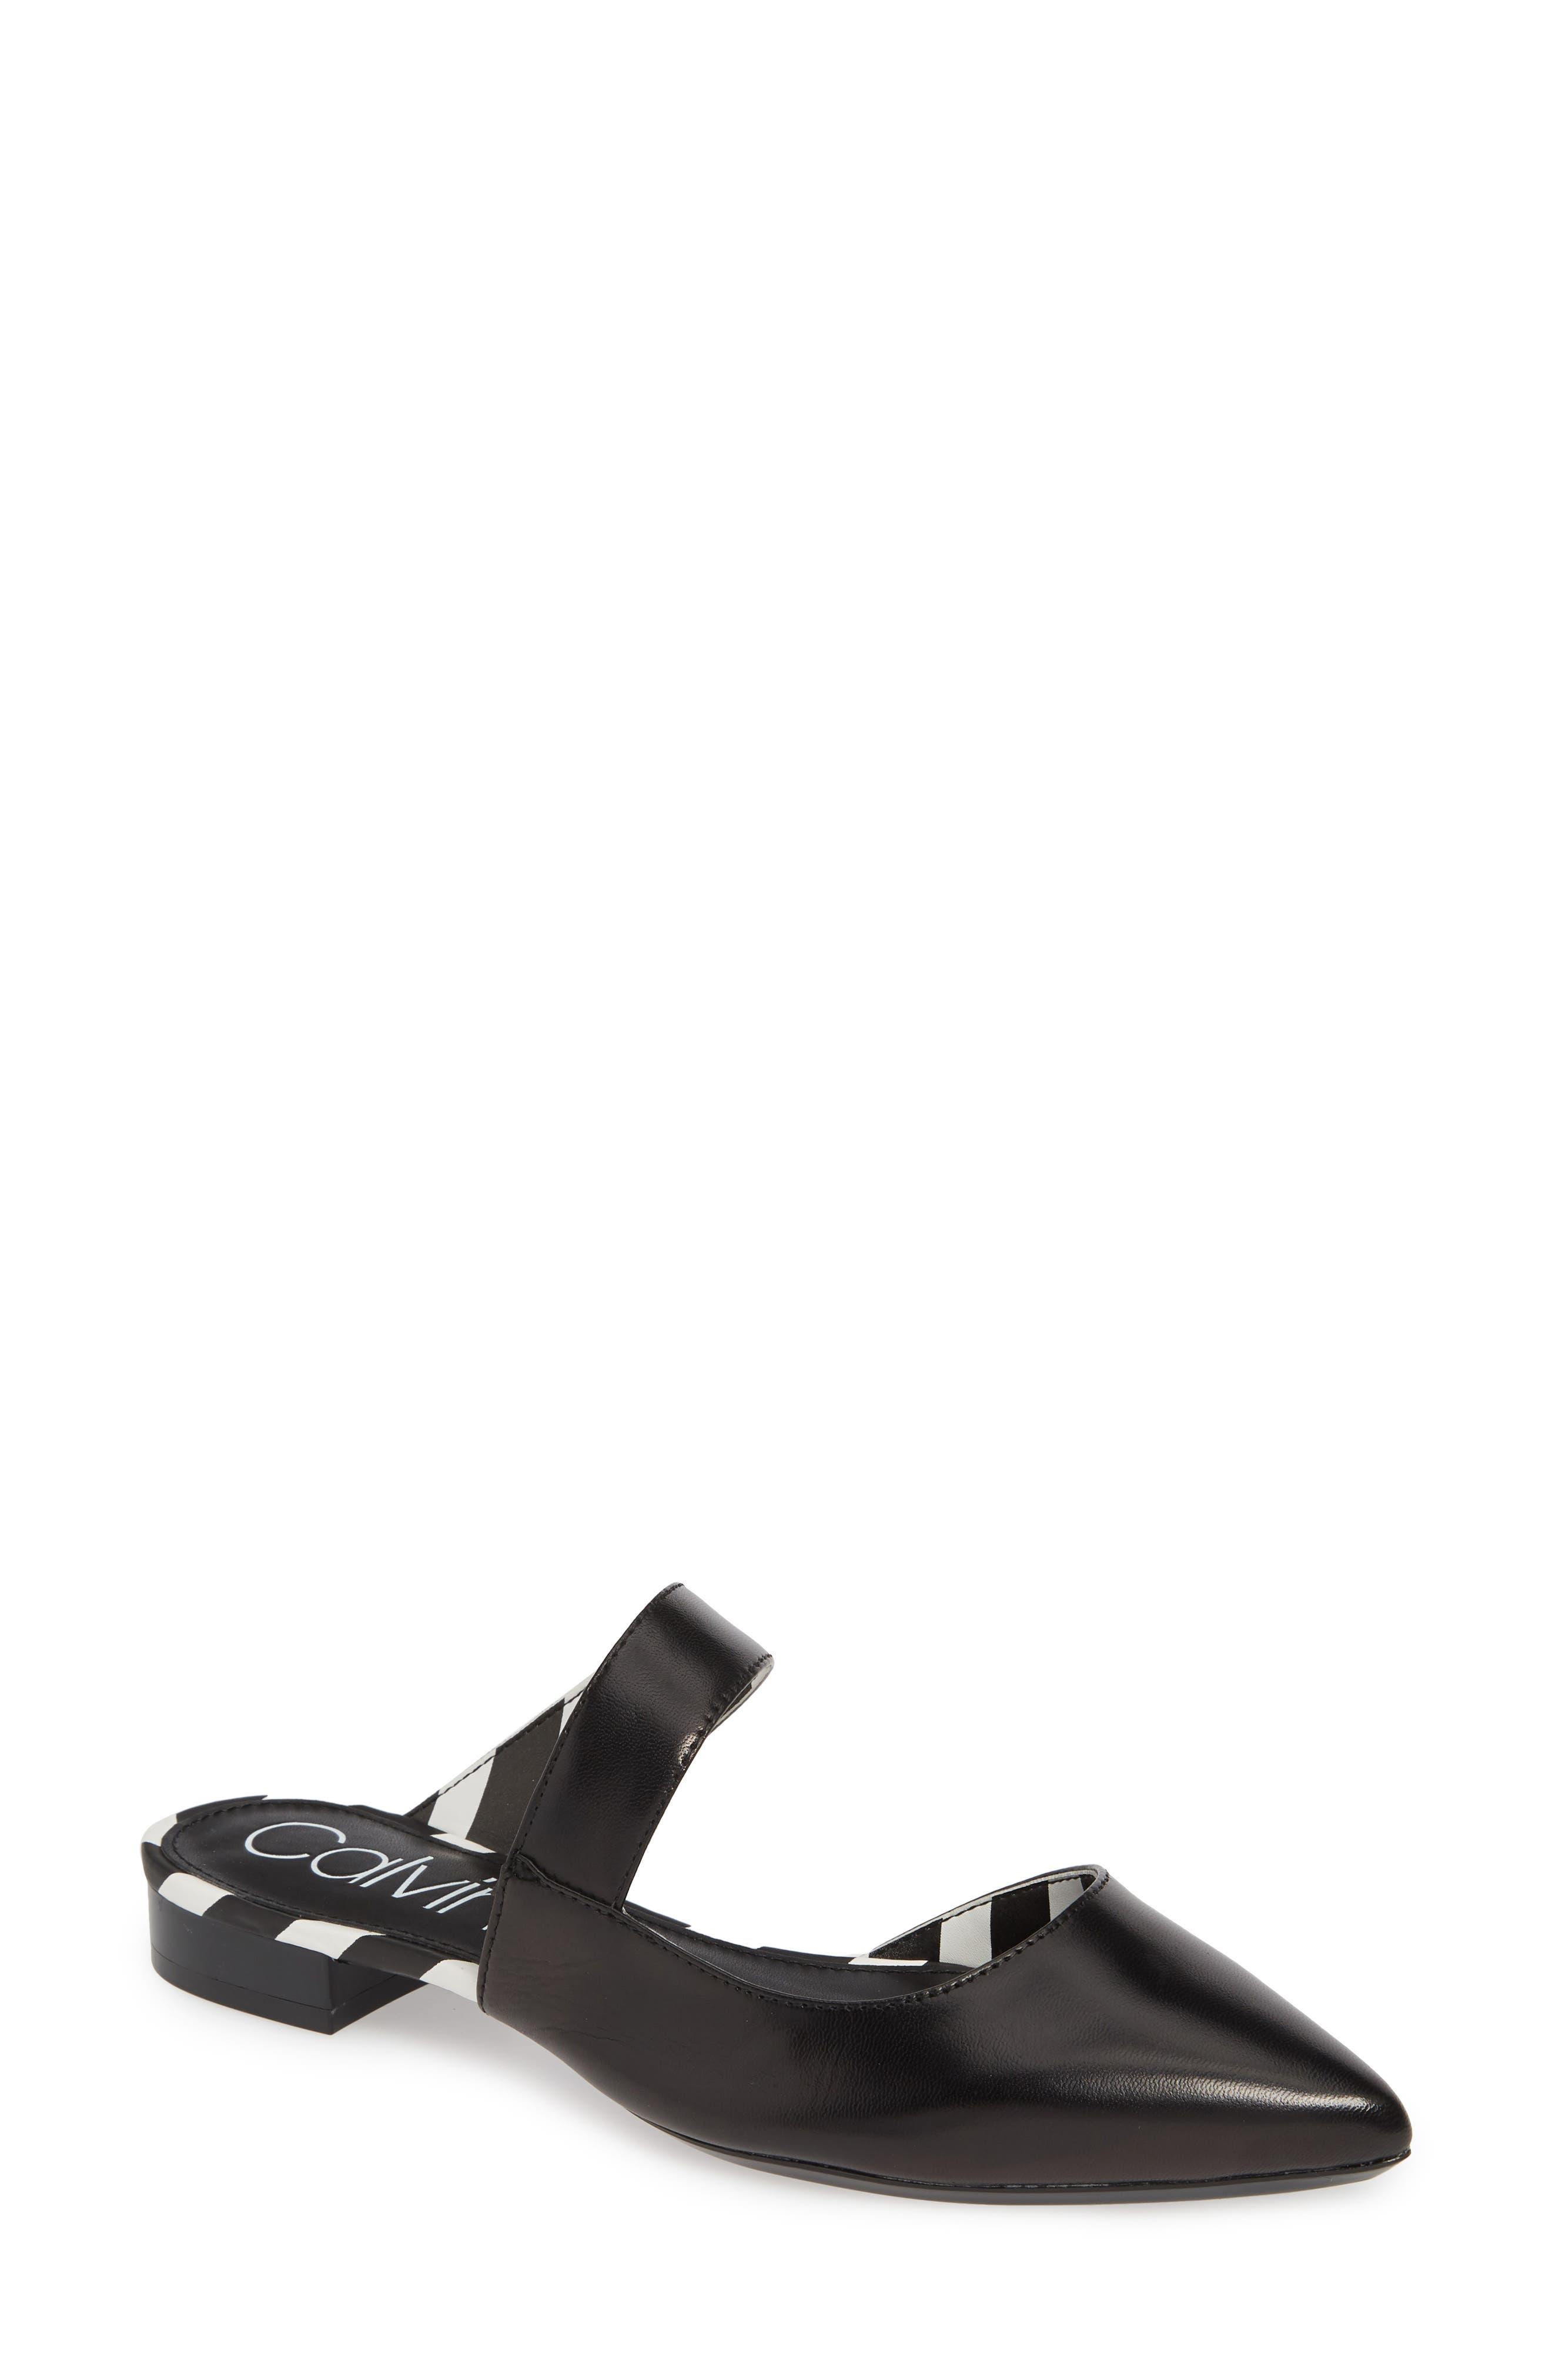 ddf635658be Calvin Klein Arleys Asymmetrical Pointy Toe Mule- Black